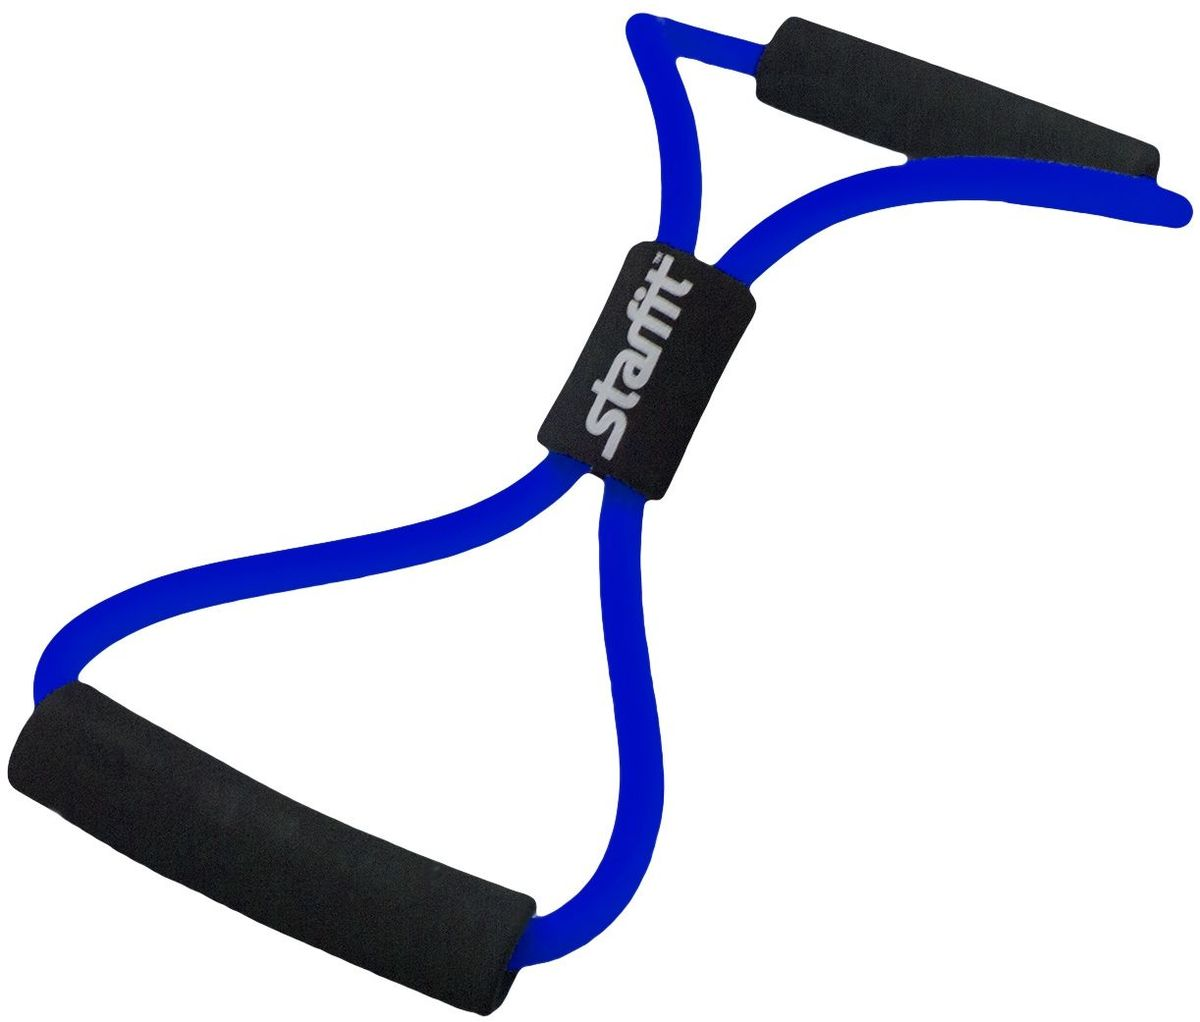 Эспандер многофункциональный Starfit ES-603, цвет: синий, 0,8 х 1,2 х 100 см эспандер ленточный starfit es 201 цвет серый 1200 х 150 х 0 55 мм